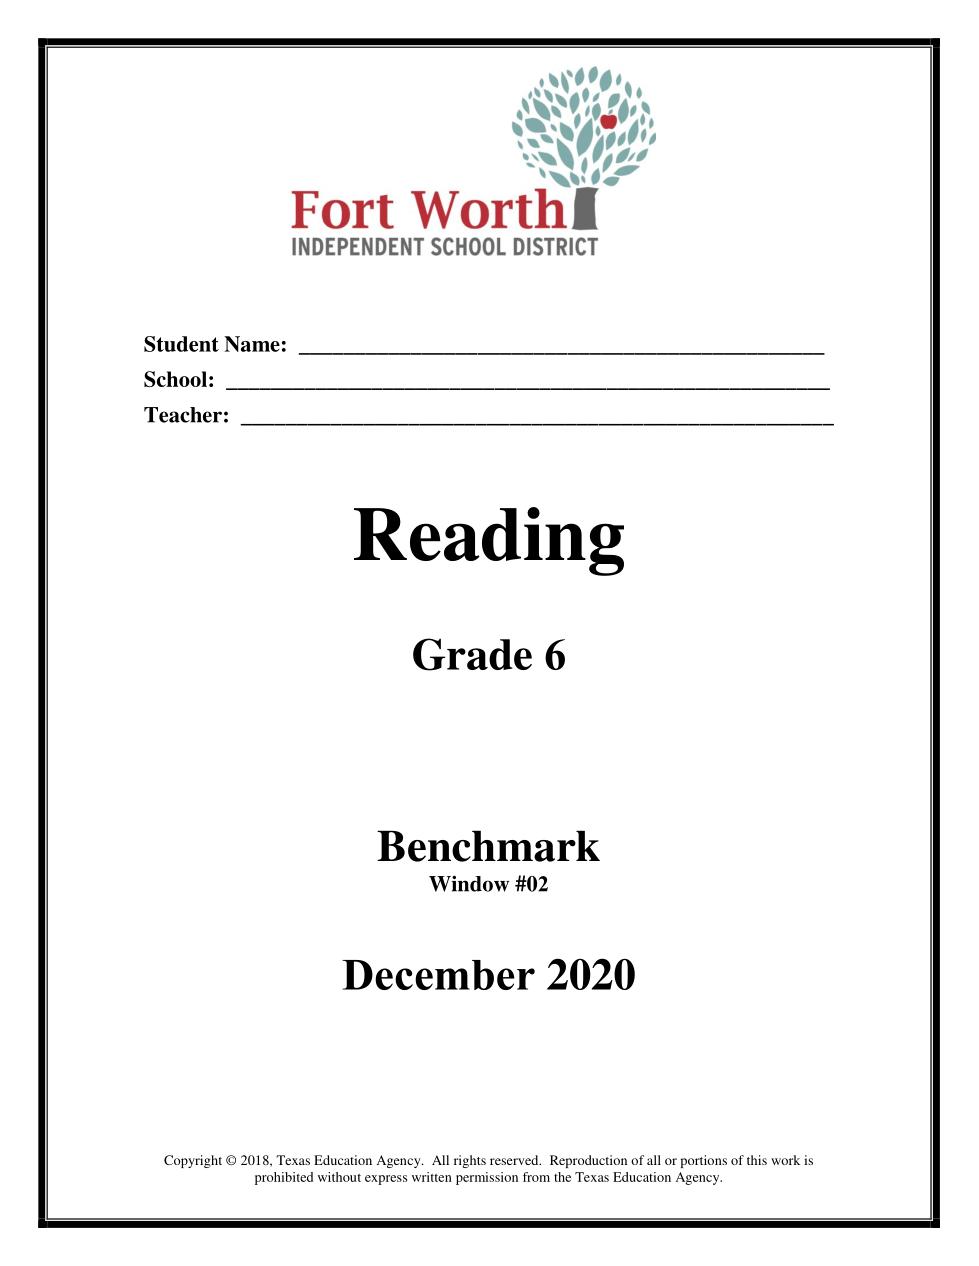 rms.056 Reading Grade 6 Benchmark Window #02 December 2020